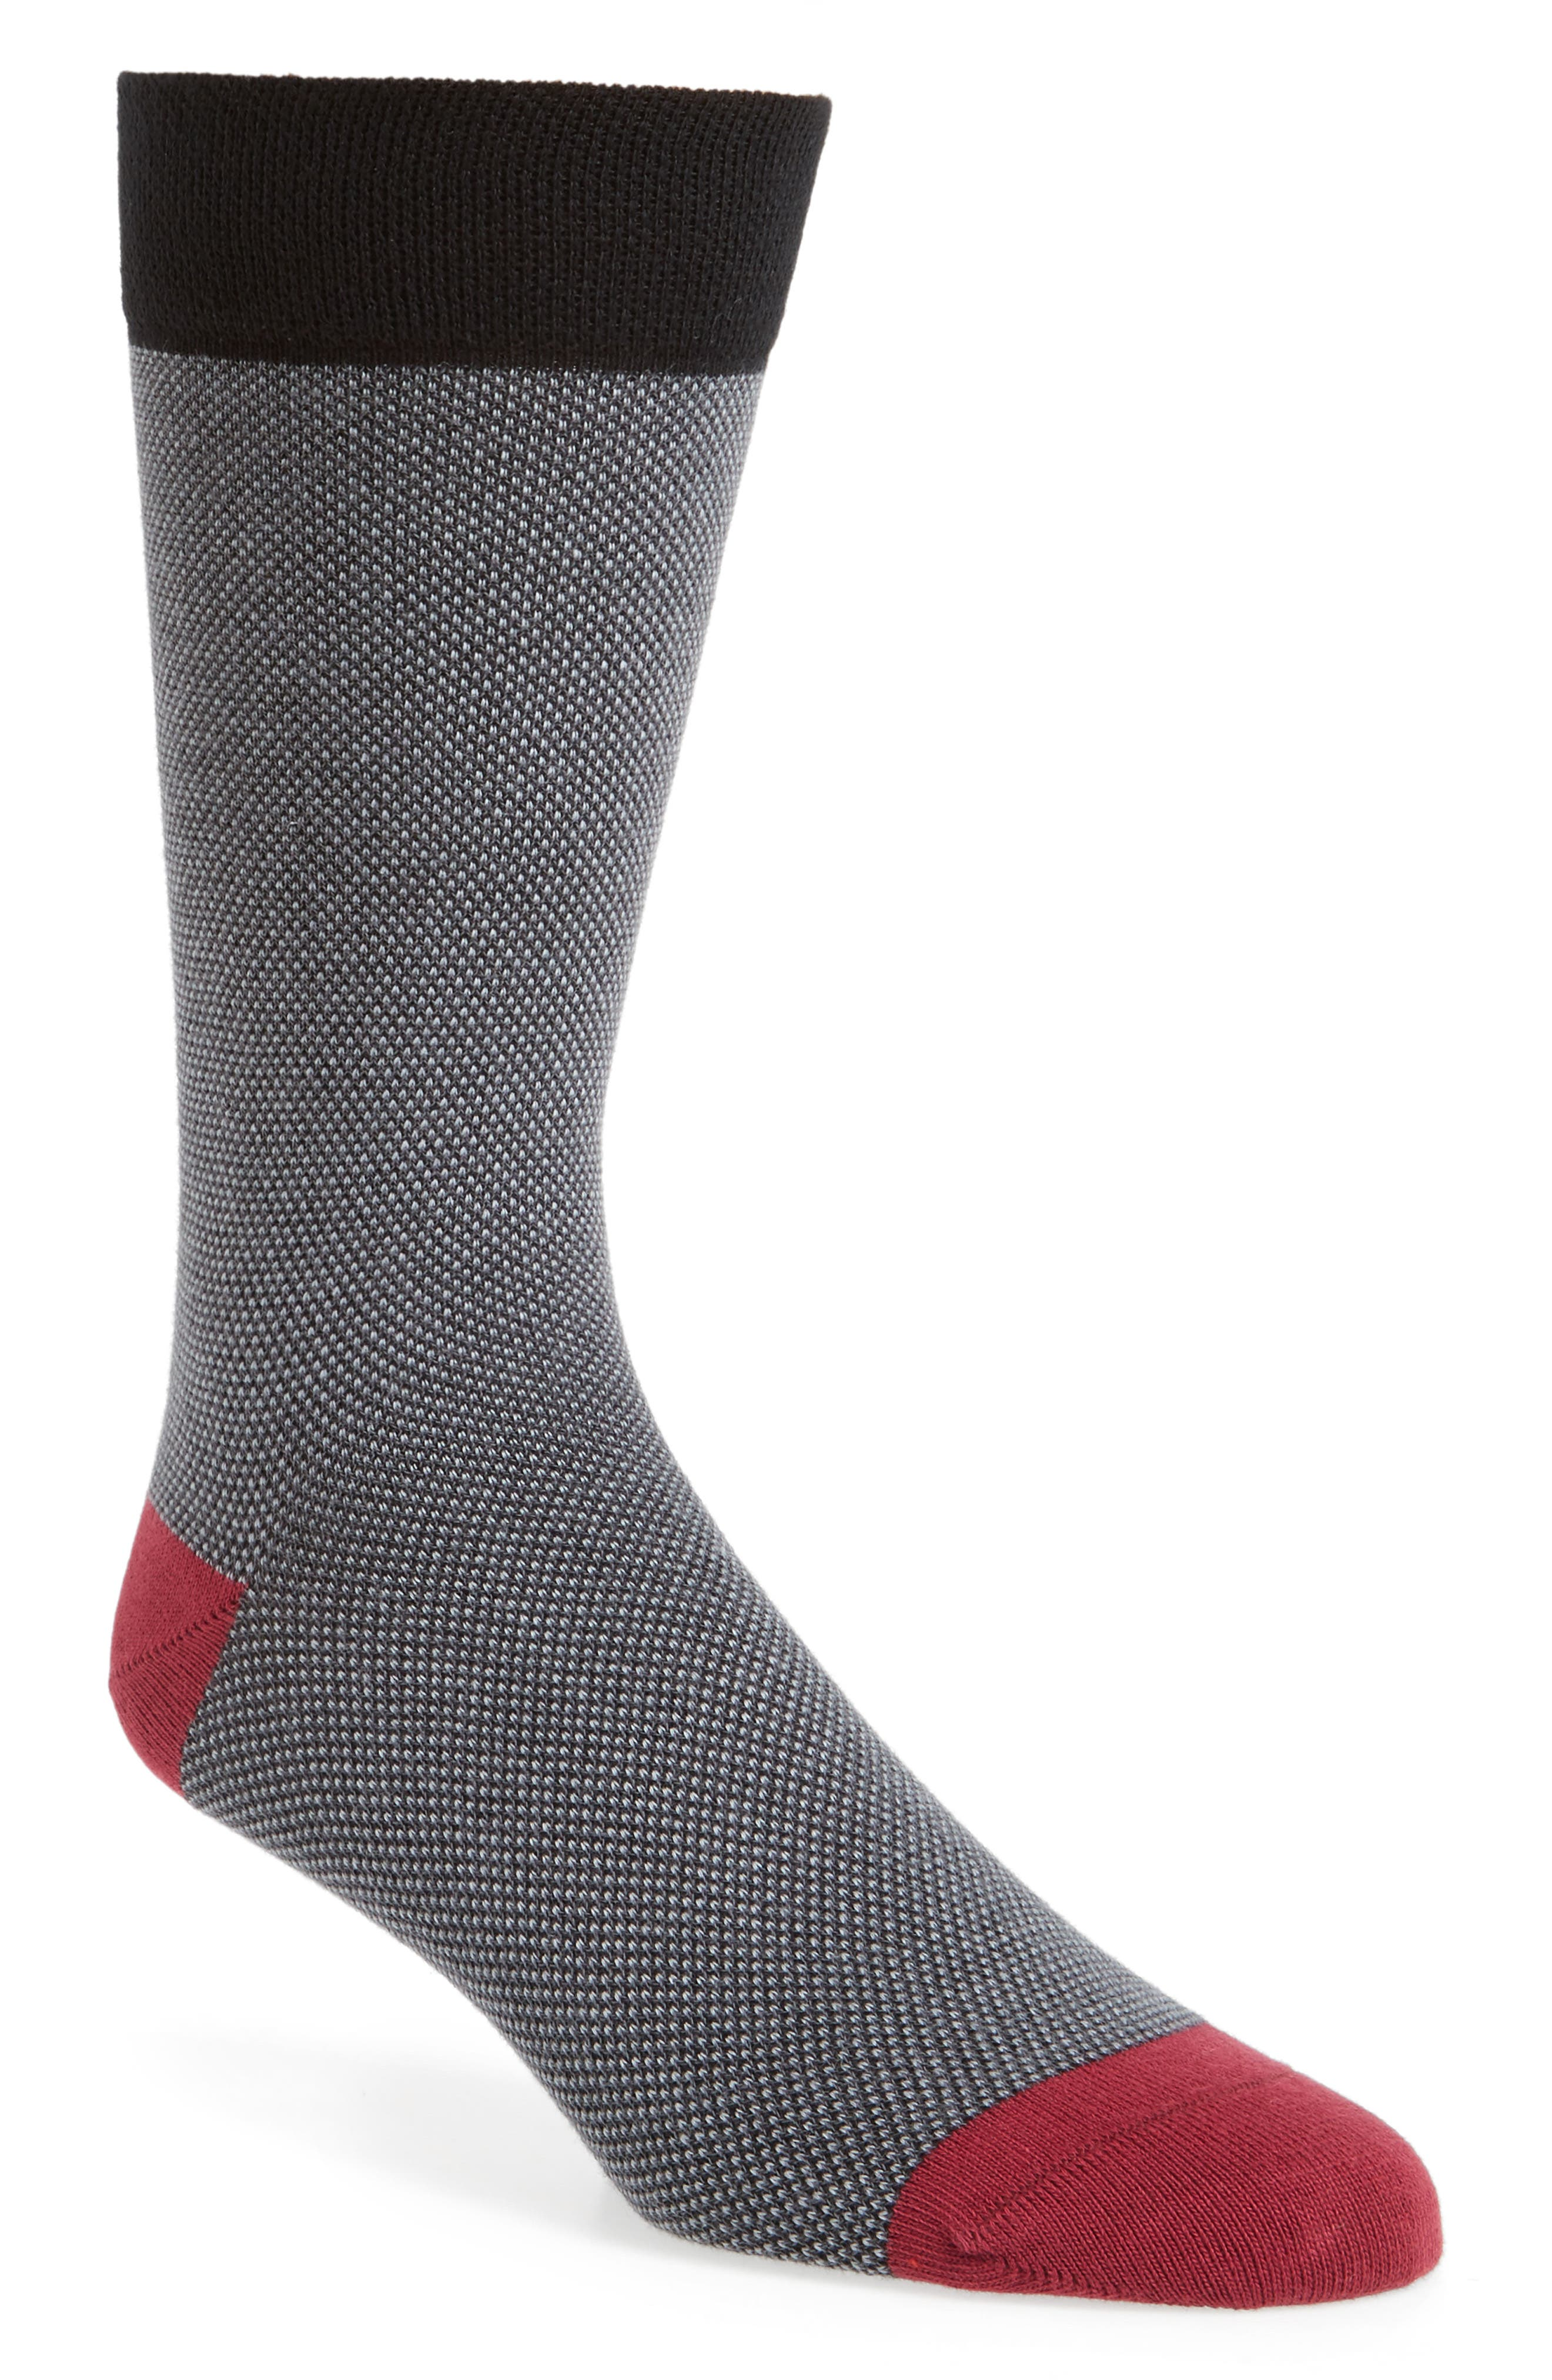 Joaquim Solid Socks,                             Main thumbnail 1, color,                             Black/ Charcoal